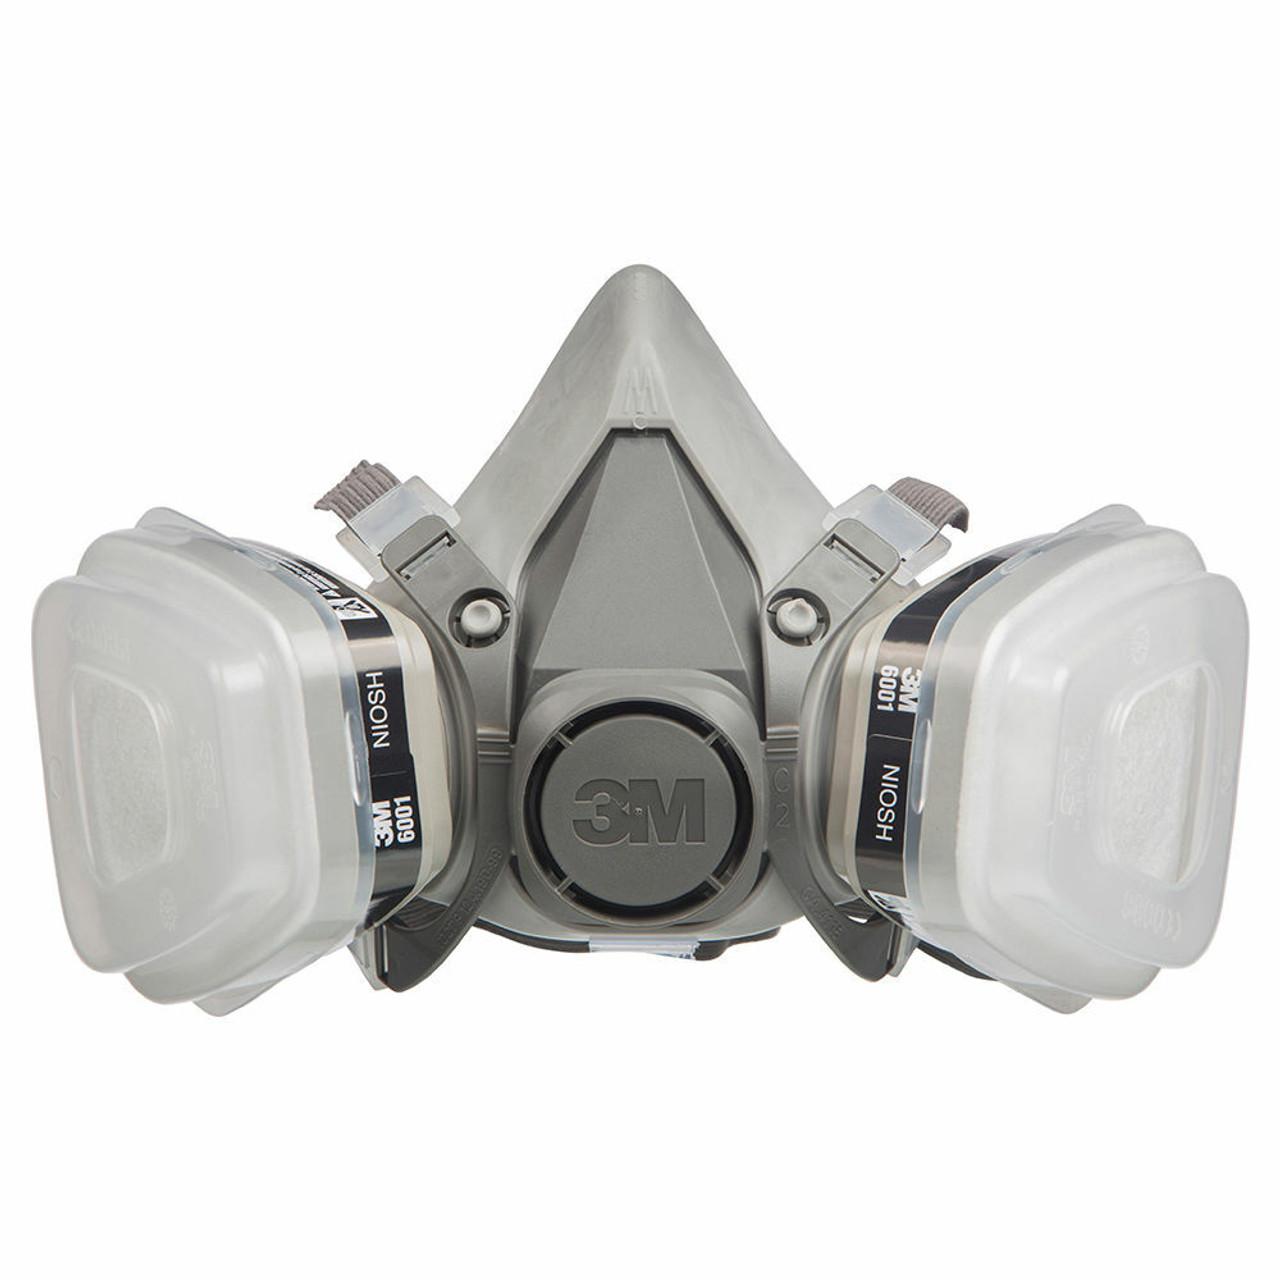 3m respiratore a1p2